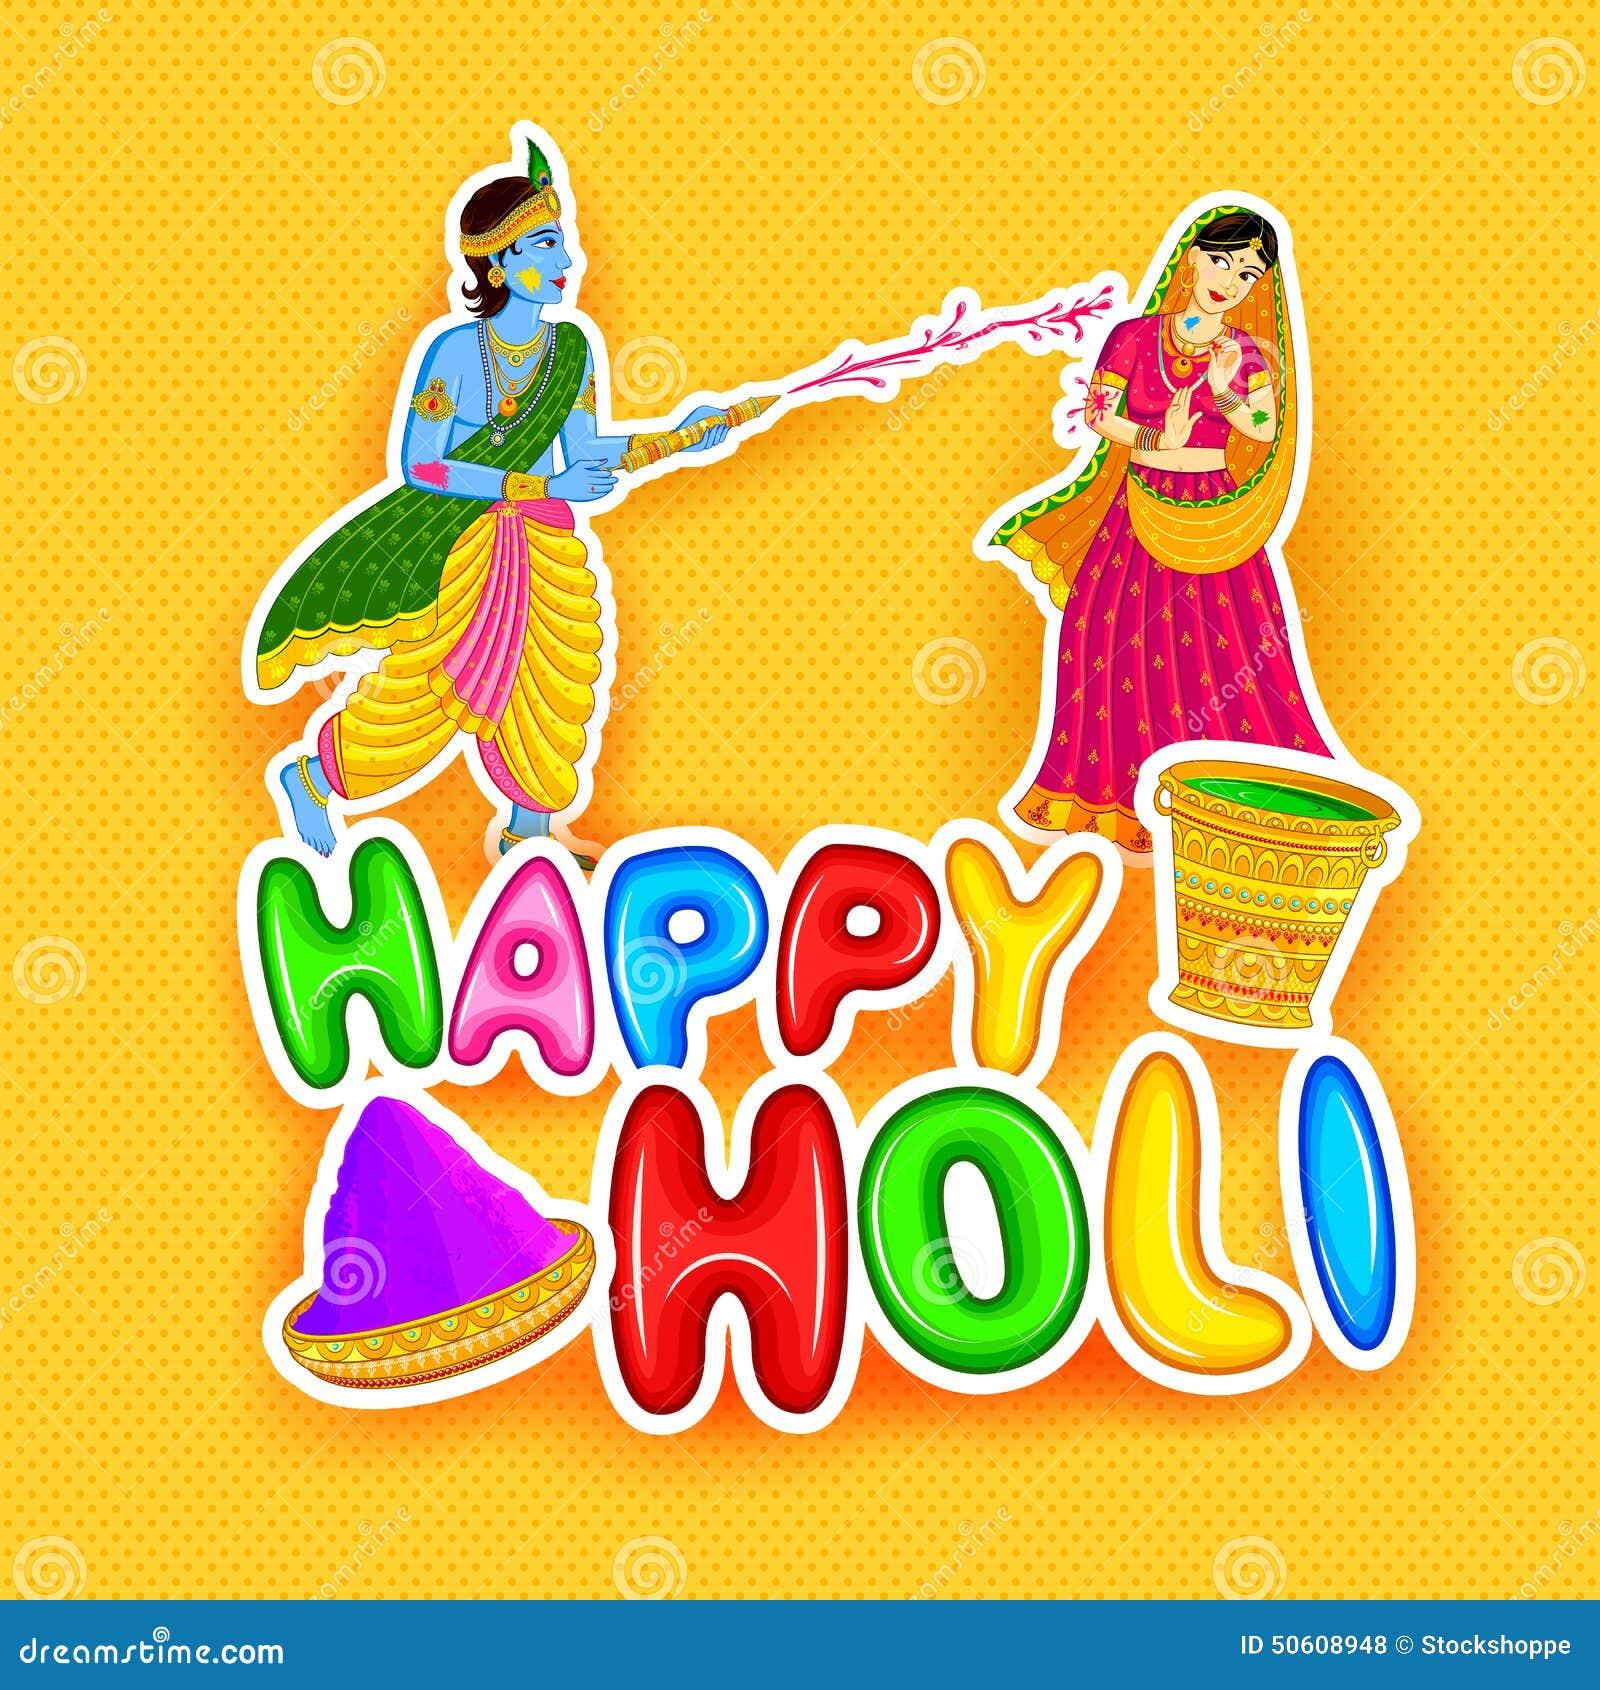 Happy holi radha krishna images - Radha Krishna Playing Holi